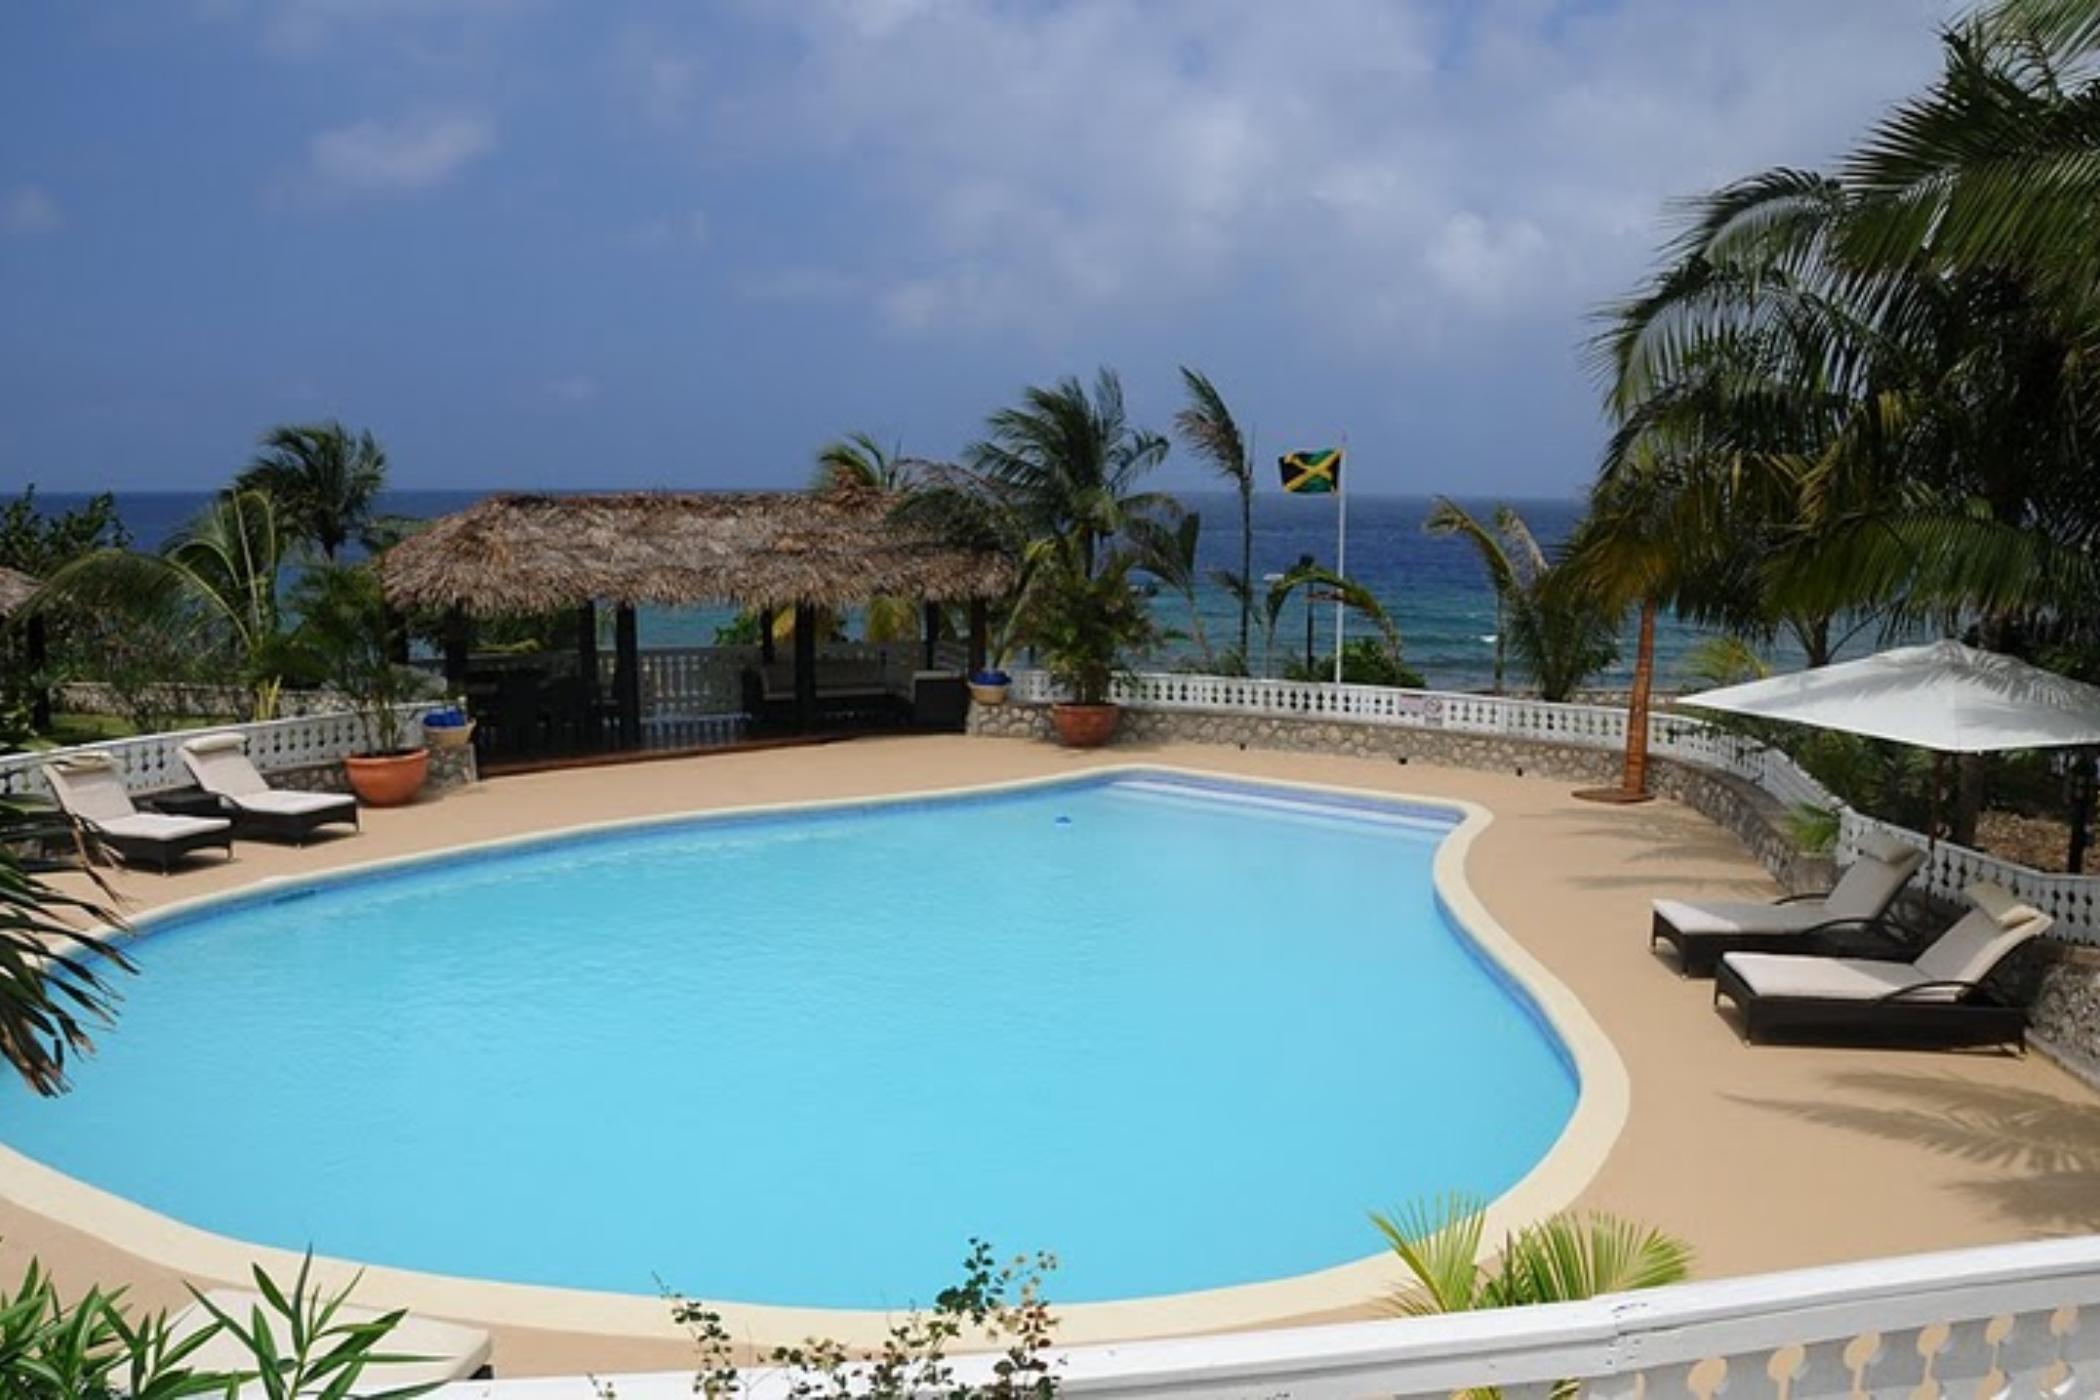 Golden Cove Villas